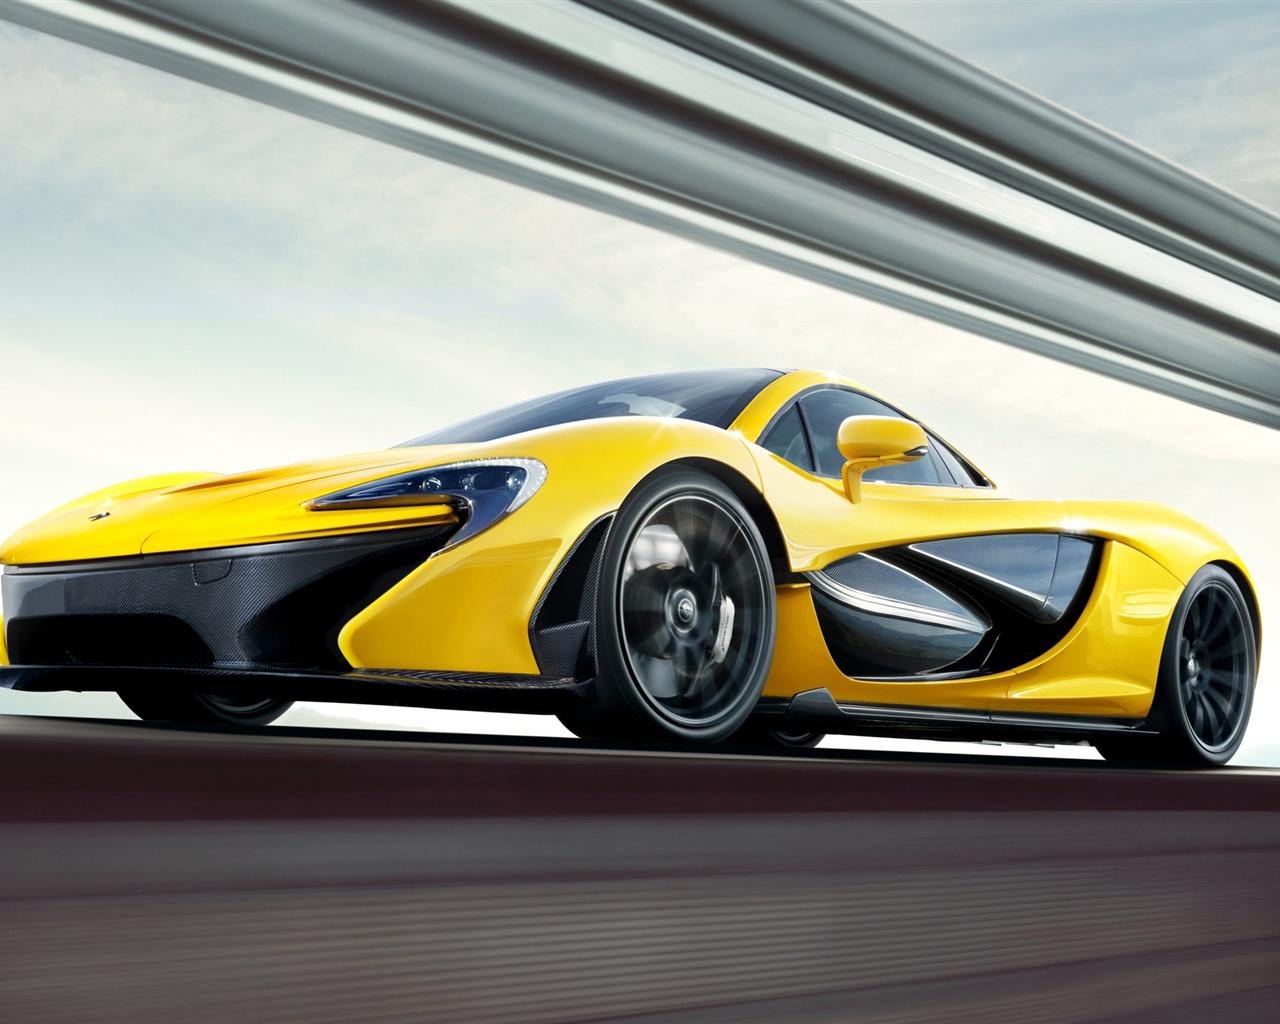 2013 McLaren P1 gelbe supercar Hintergrundbilder 1280x1024 1280x1024